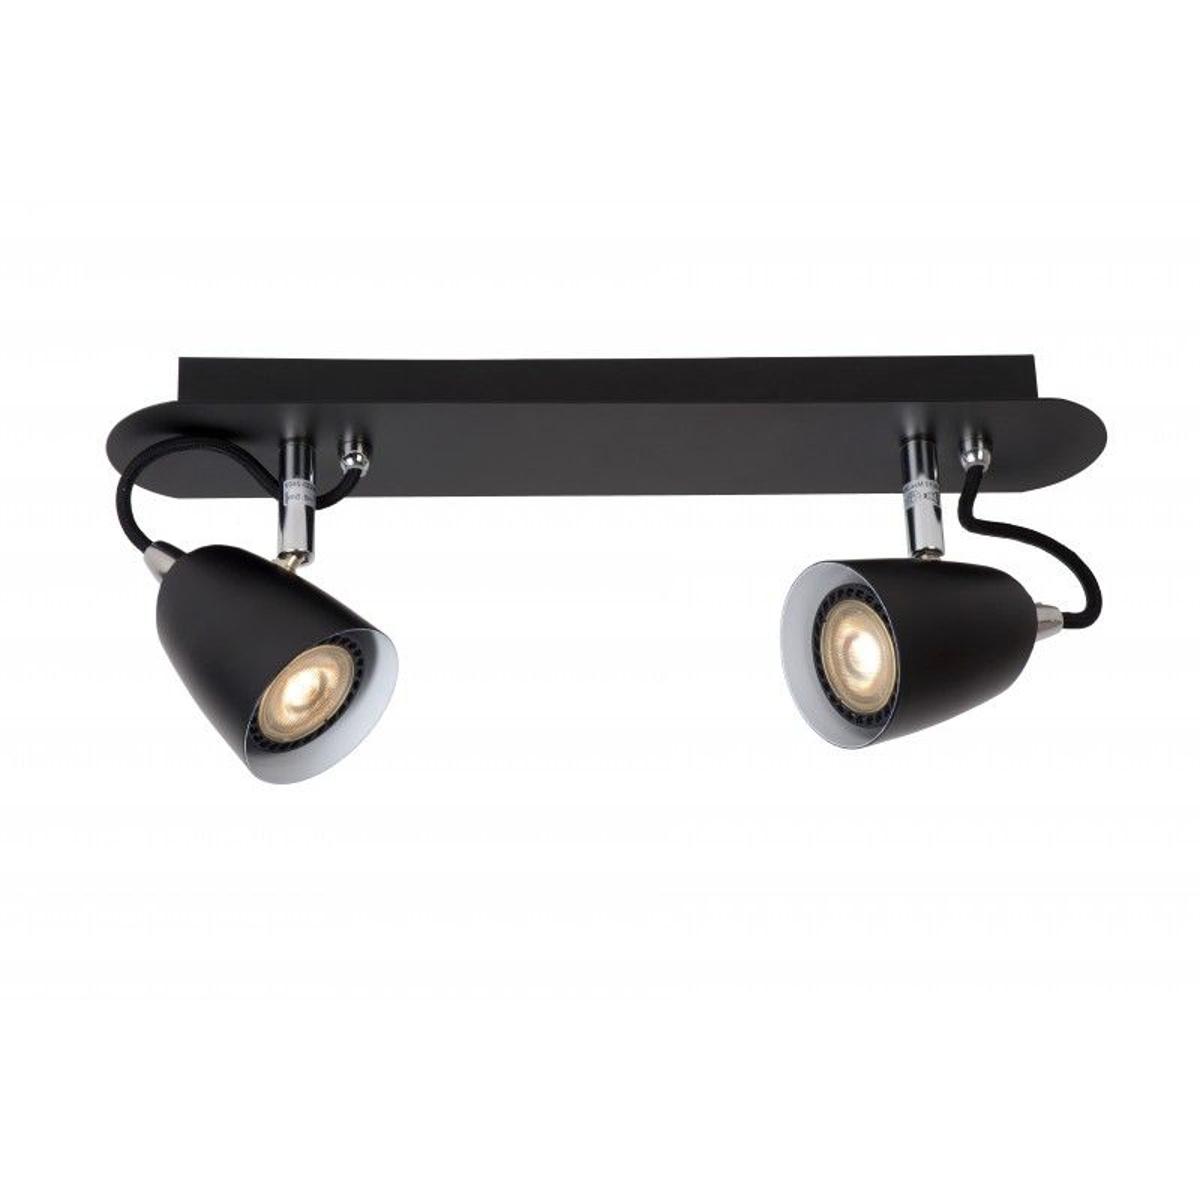 Spot Plafond Ride LED - LED Dim. - GU10 - 2x5W 3000K